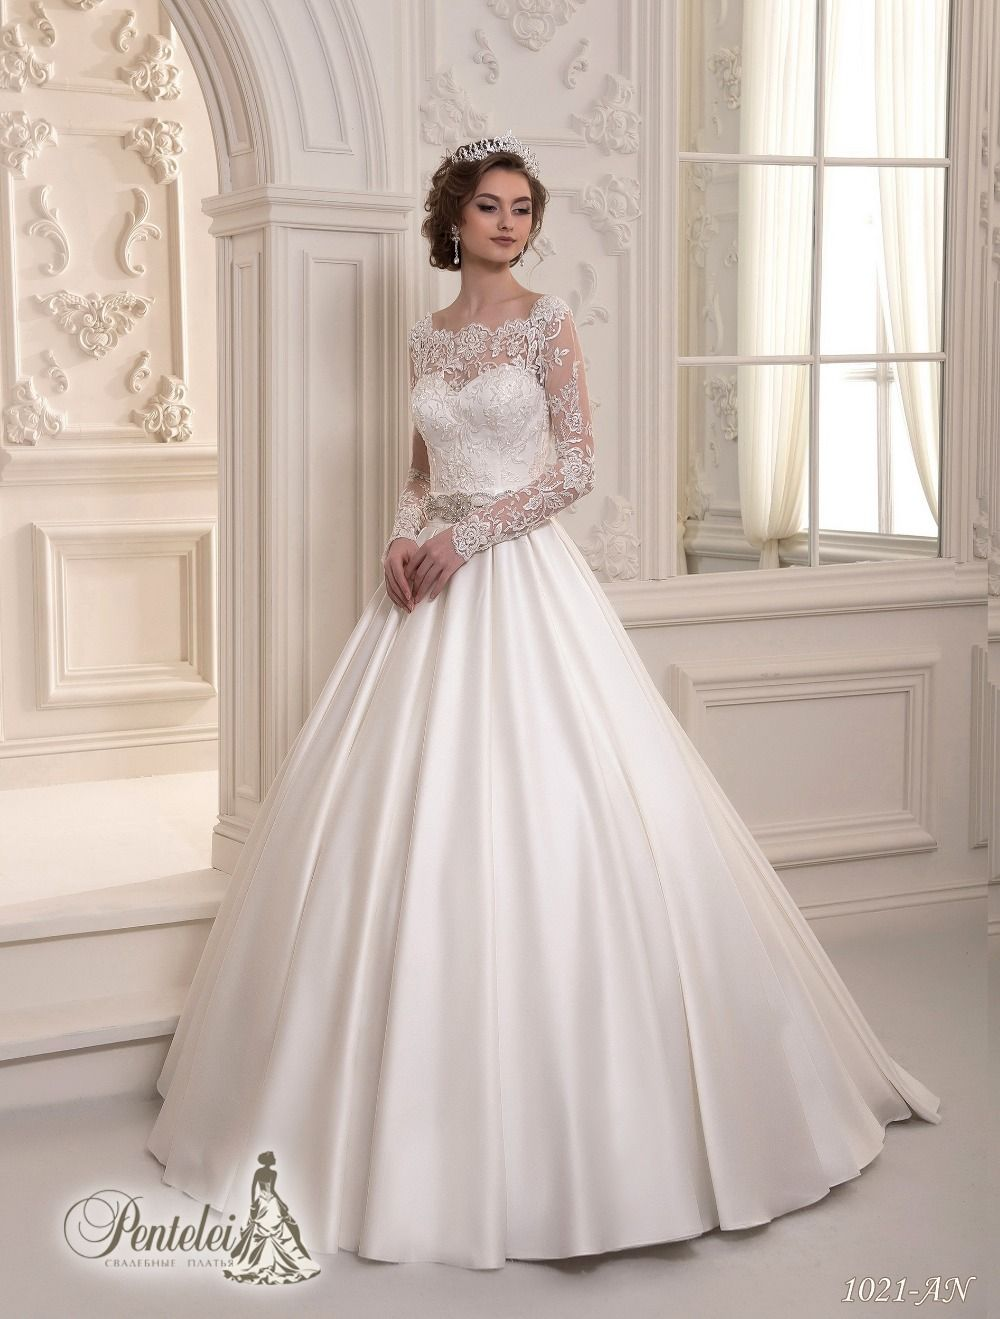 2015 Latest Long Sleeves Low Back Lace Top Satin Skirt Wedding Dress Vestido De Noiva In Wedding Dresses Elegant Wedding Dress Illusion Neckline Wedding Dress